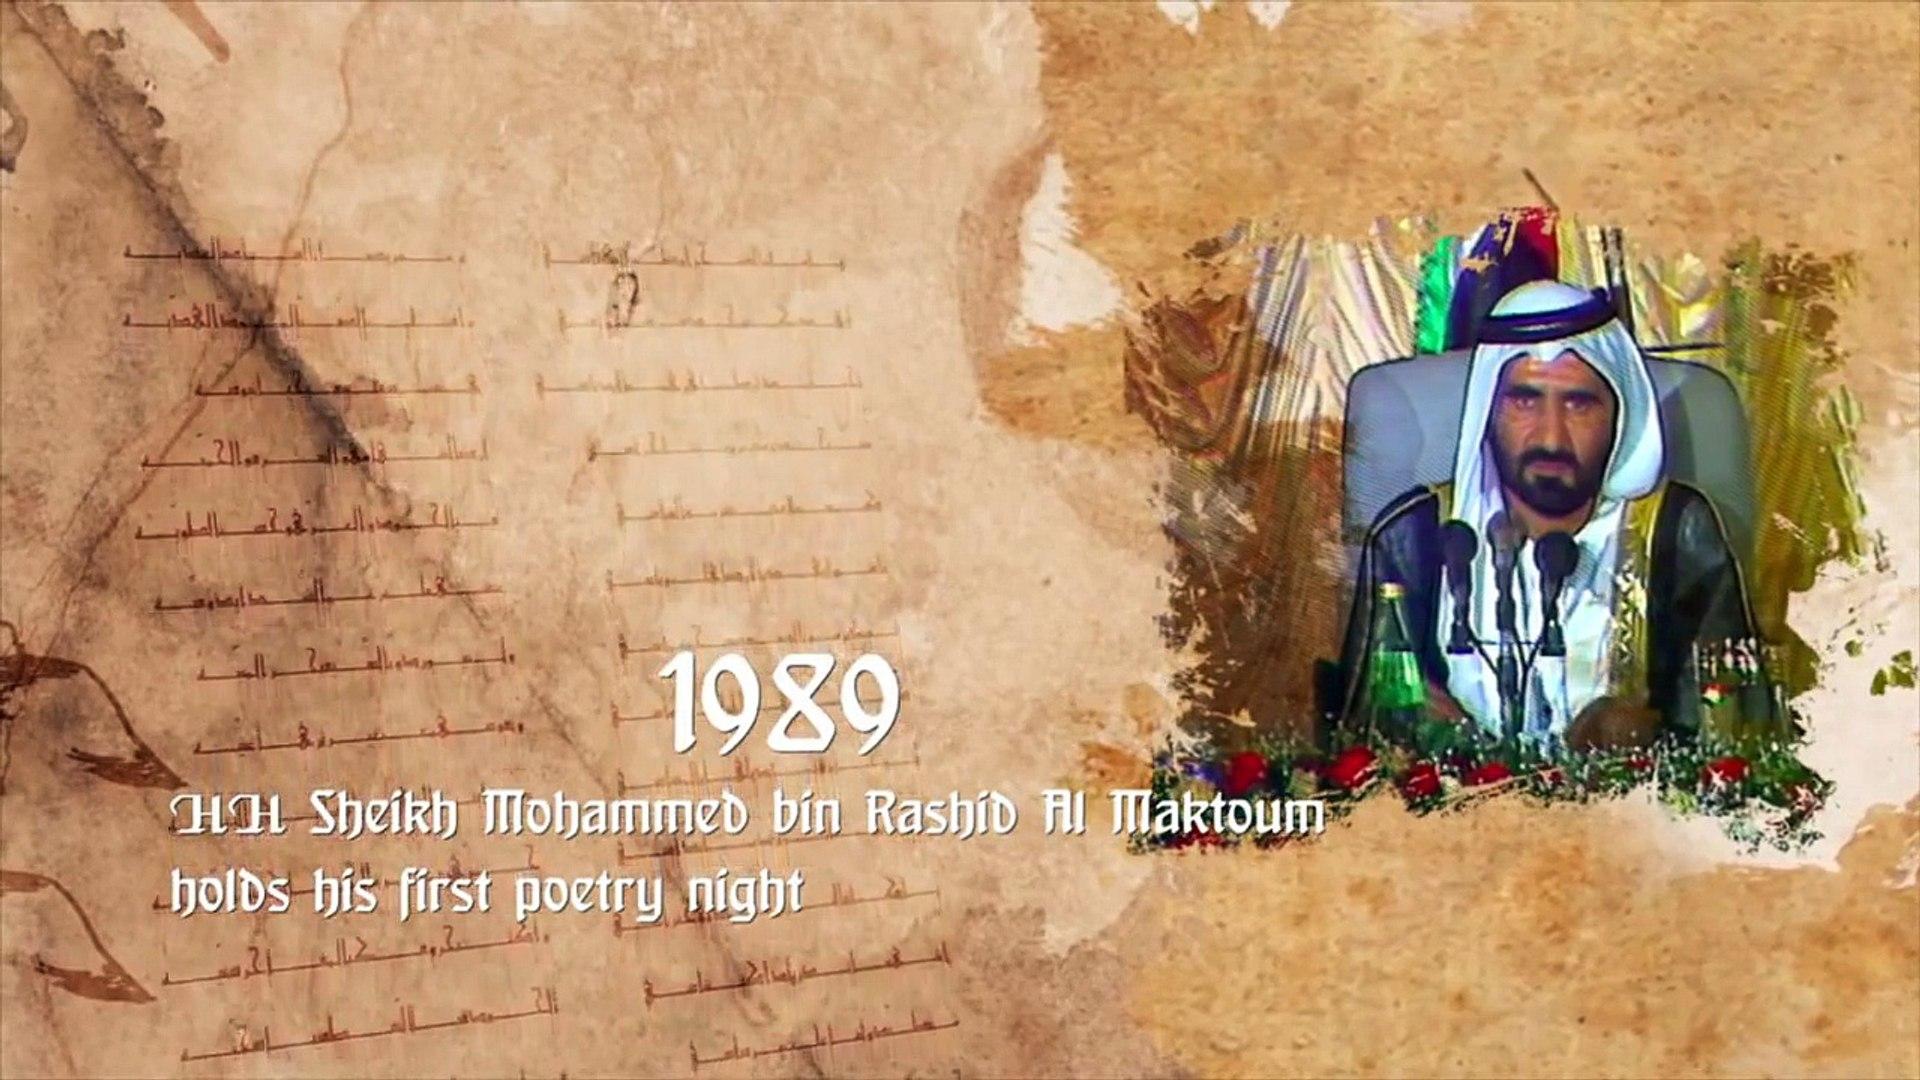 The Journey His Highness Sheikh Muhammad Bin Rashid Al Maktoum Ruler of Dubai-1949 to 2020